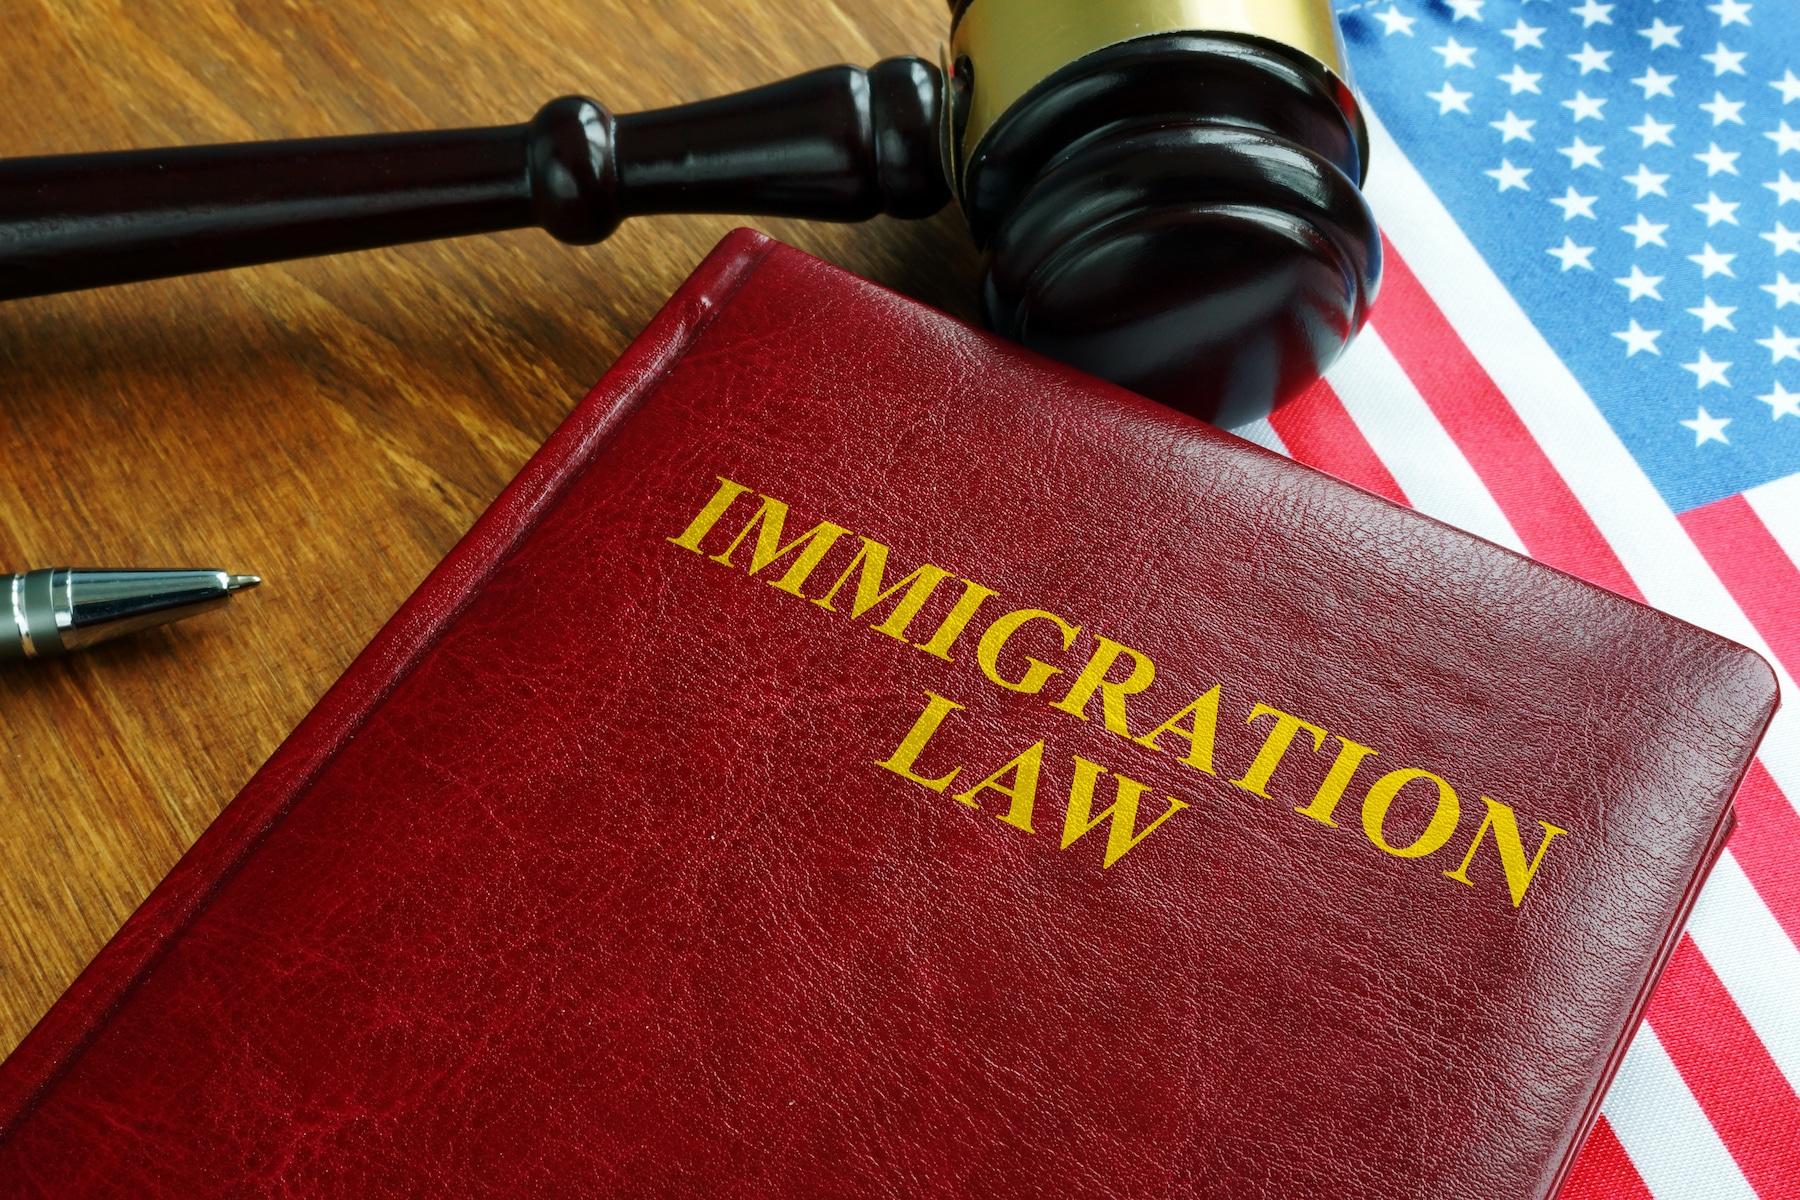 Immigration law act and USA flag.